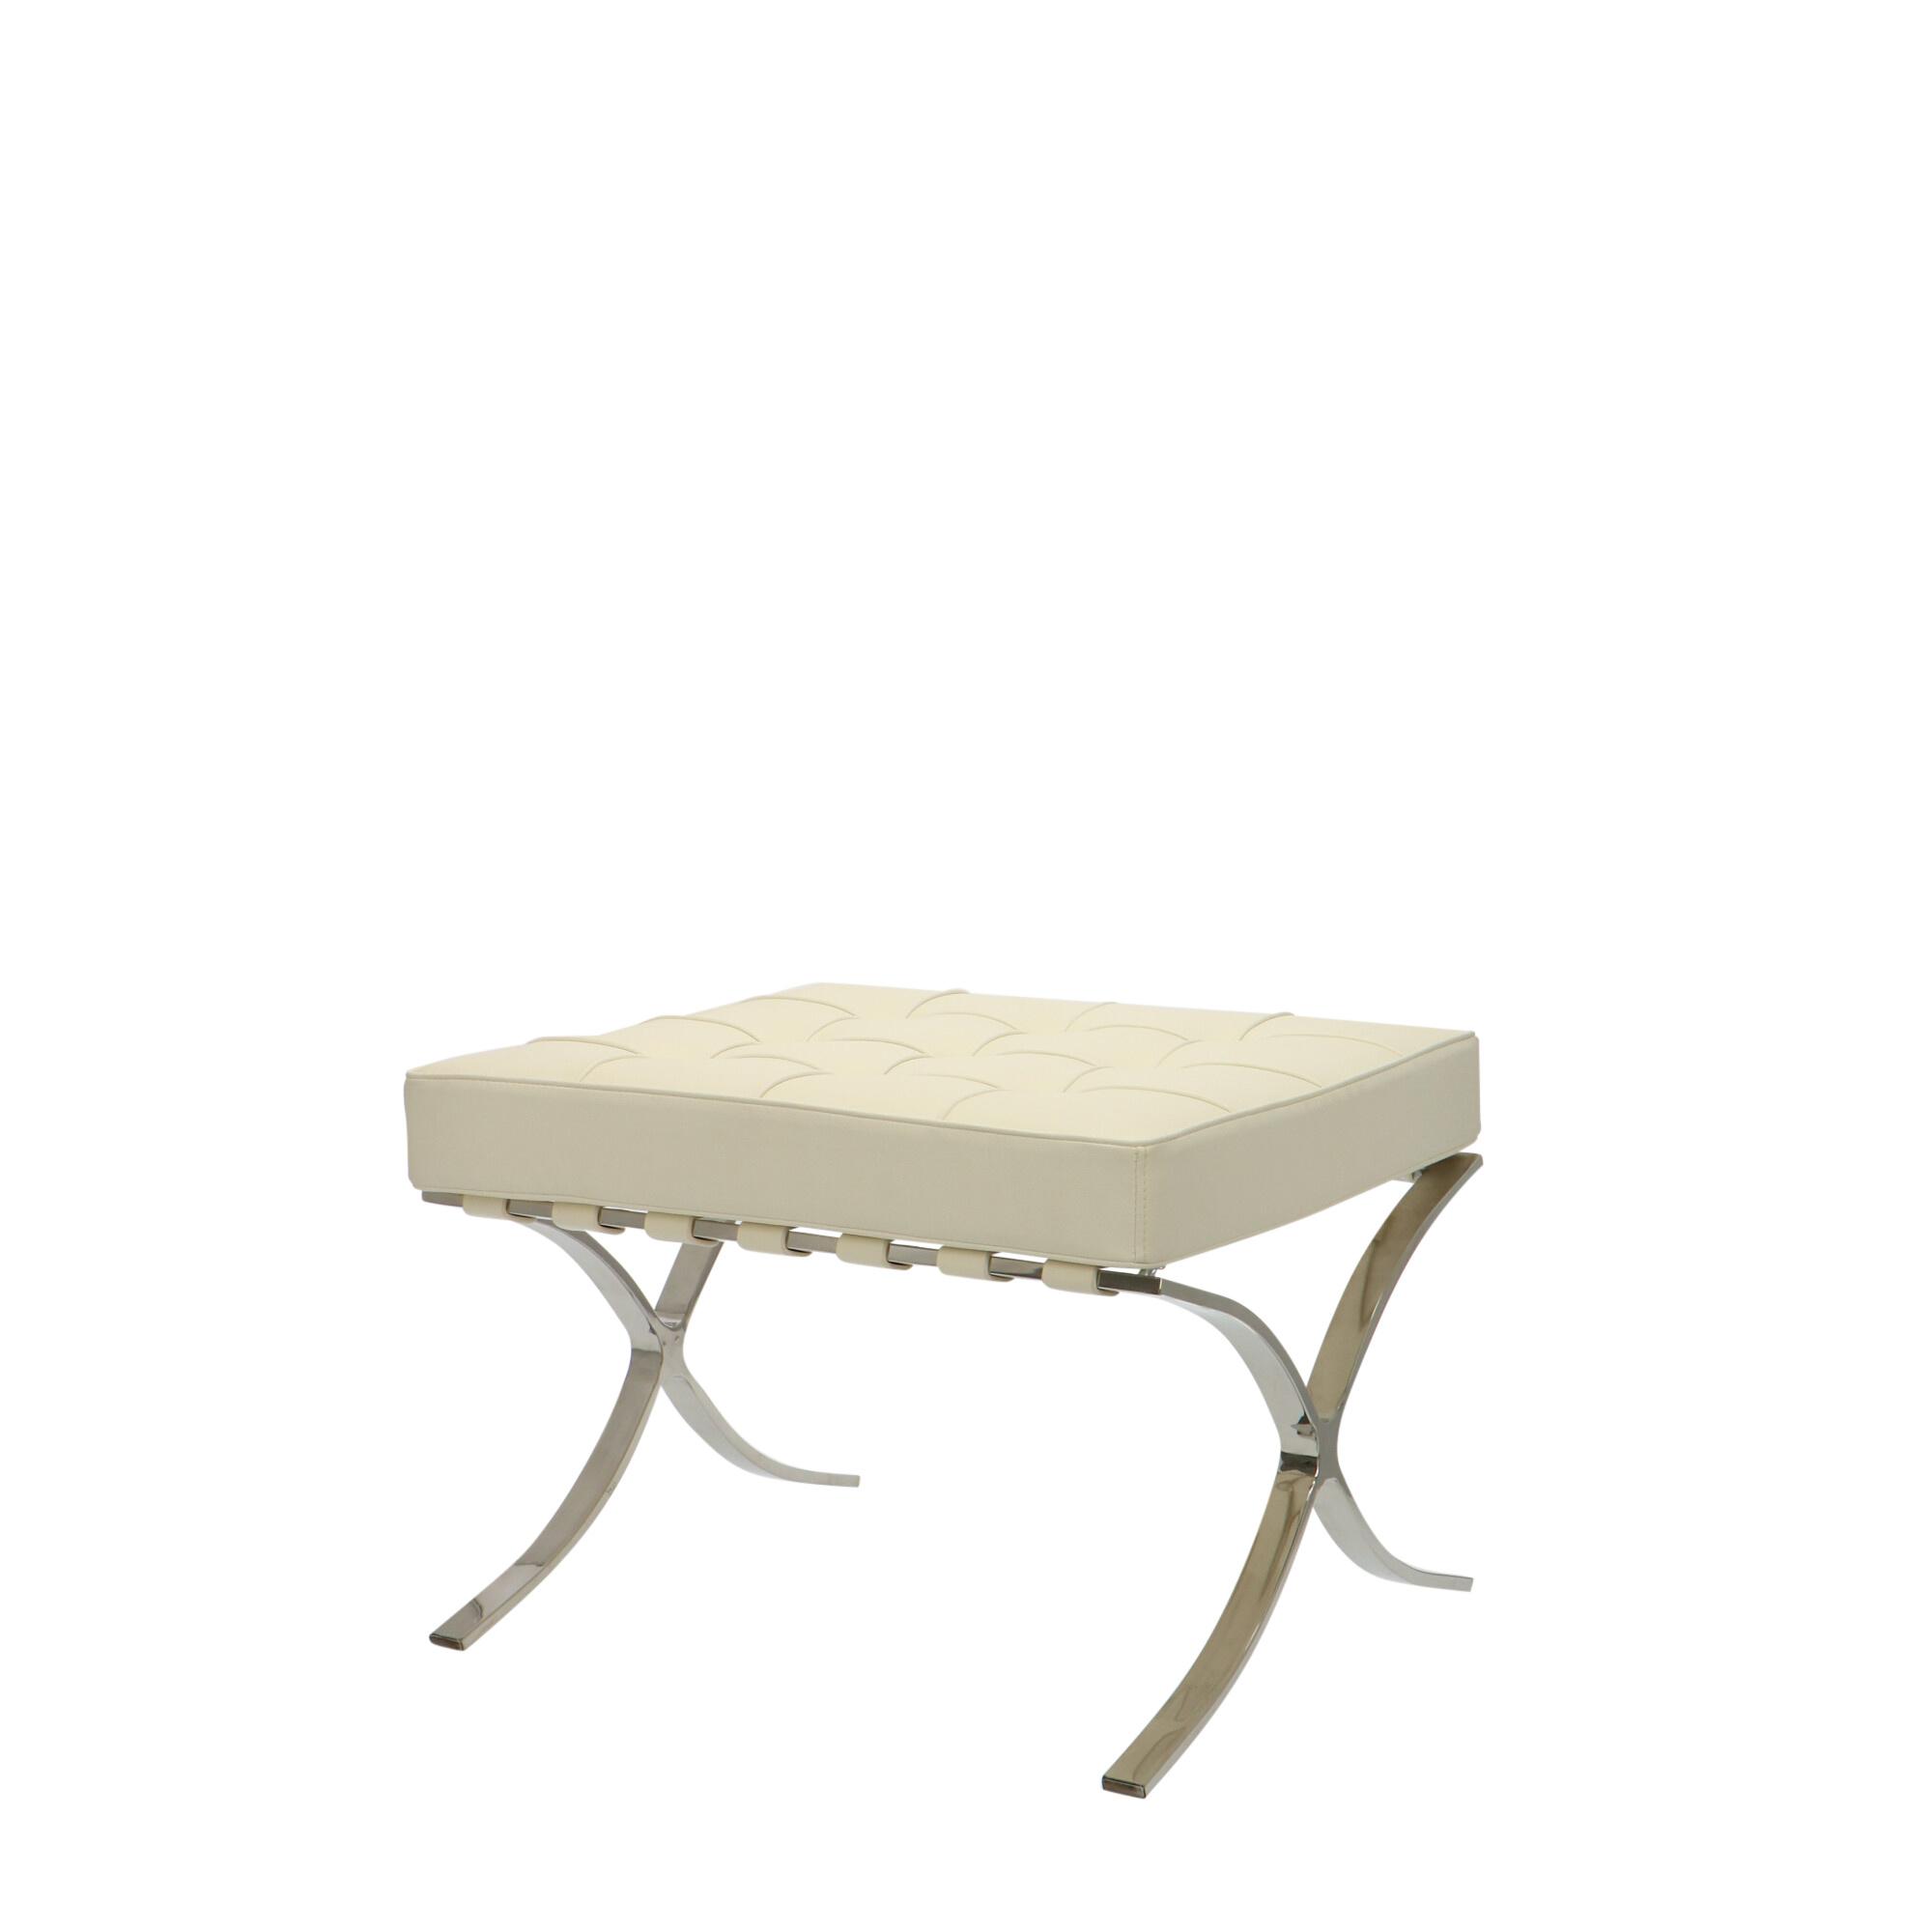 Cool Barcelona Chair Ottoman Creme Barcelonachair Nl Ibusinesslaw Wood Chair Design Ideas Ibusinesslaworg